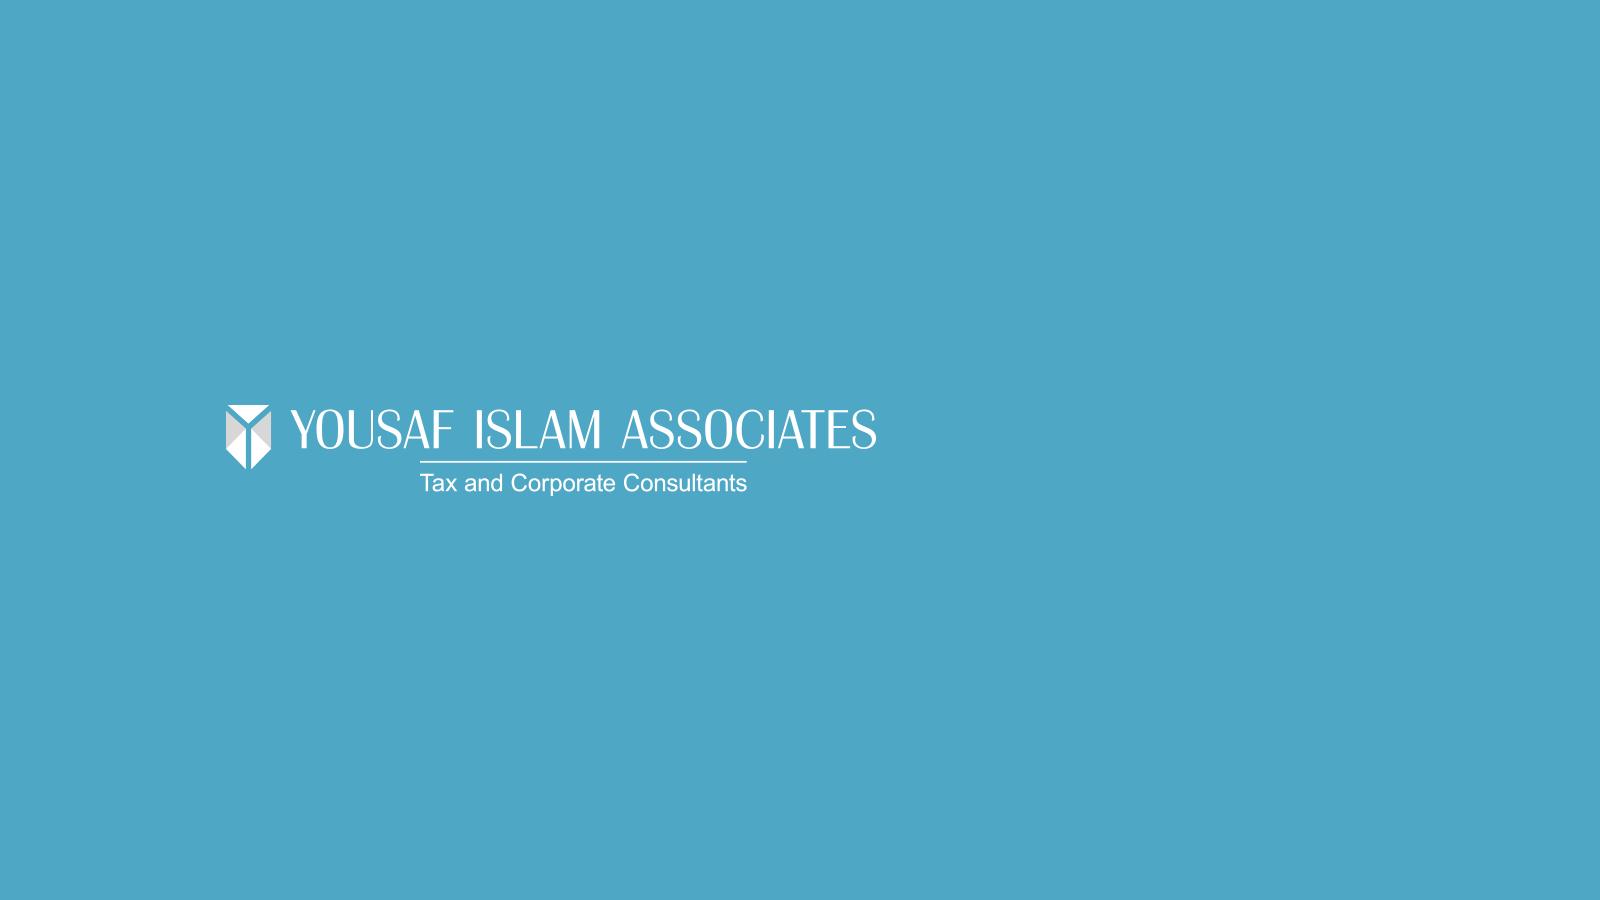 graphic-brand-design-web-designer-hiline-lahore-pakistan-yousaf-islam-banner